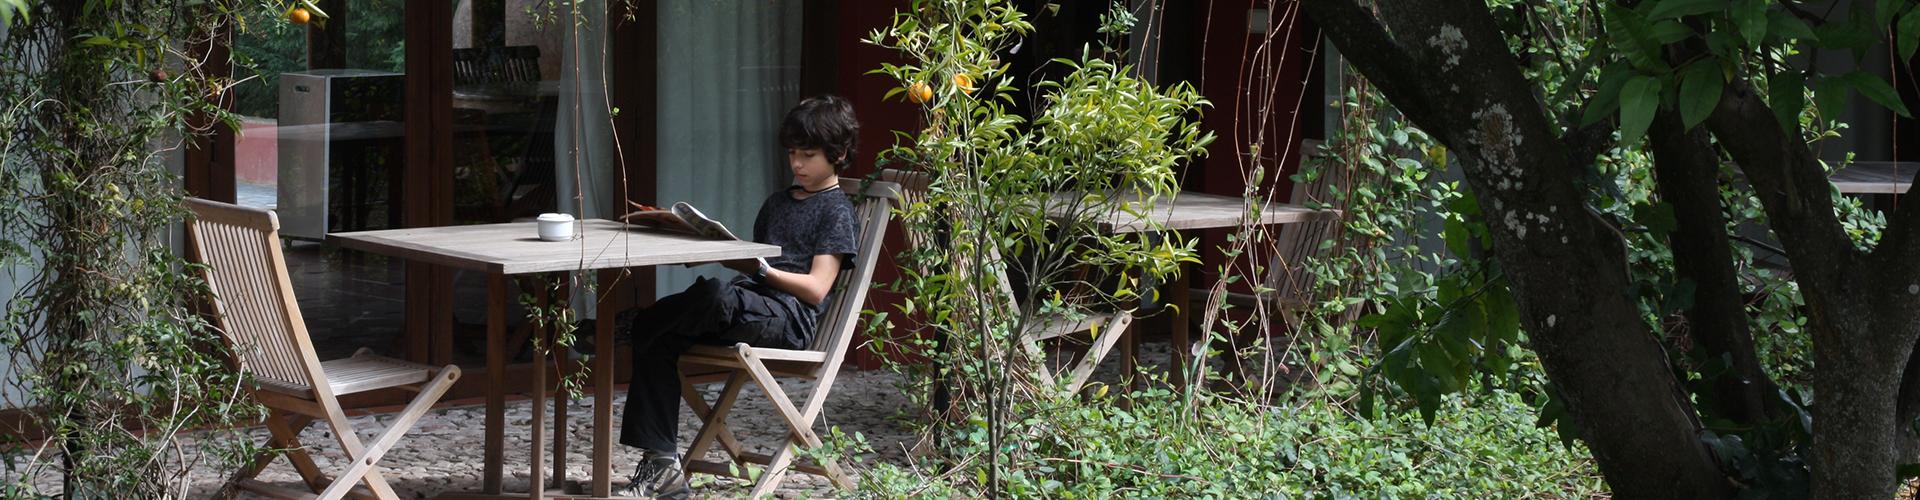 CASA DO TERREIRO DO POÇO. Leyendo un libro en el jardín.